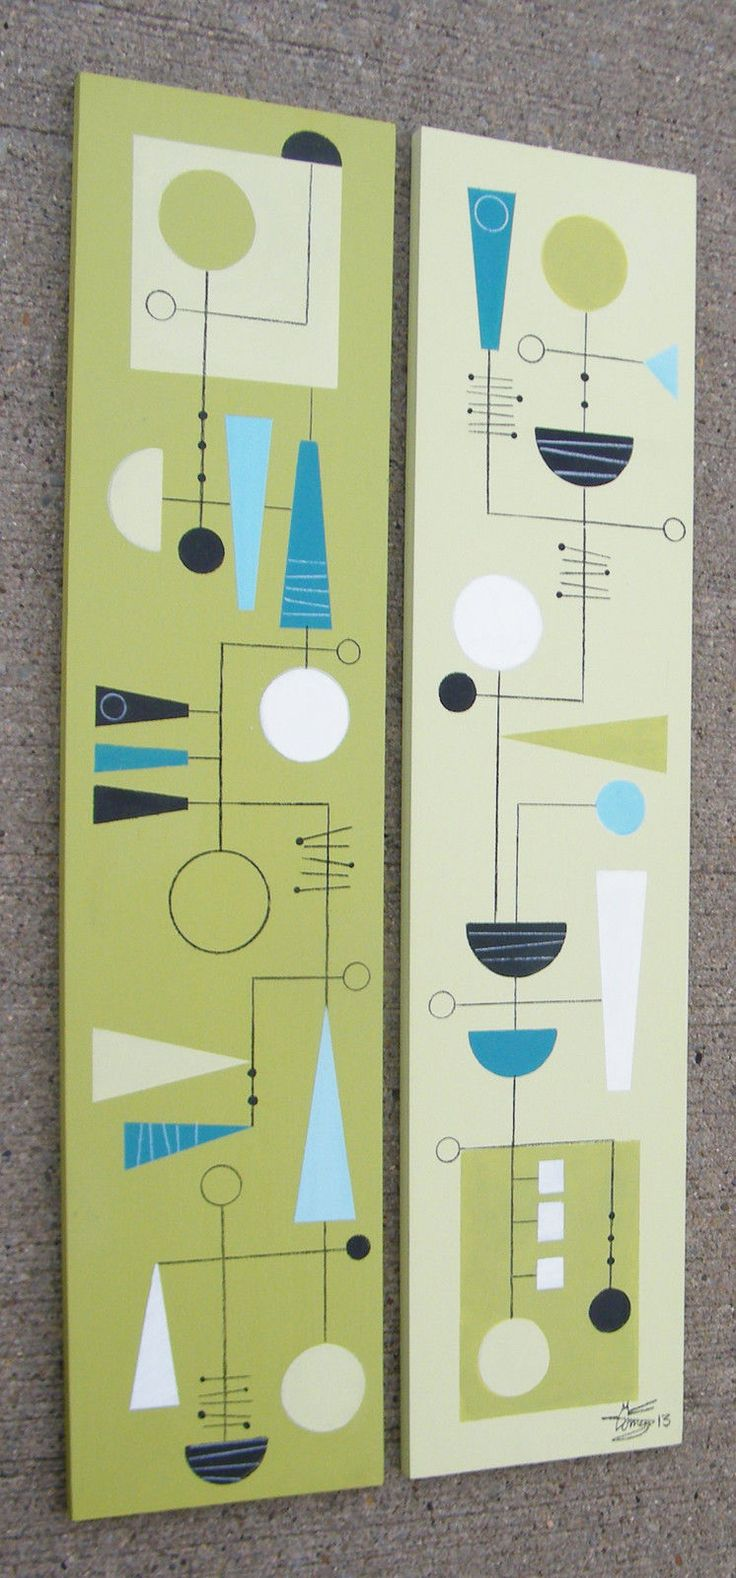 2 El Gato Gomez Paintings Retro Mid Century Modern Abstract Atomic Eames 1950s   eBay..